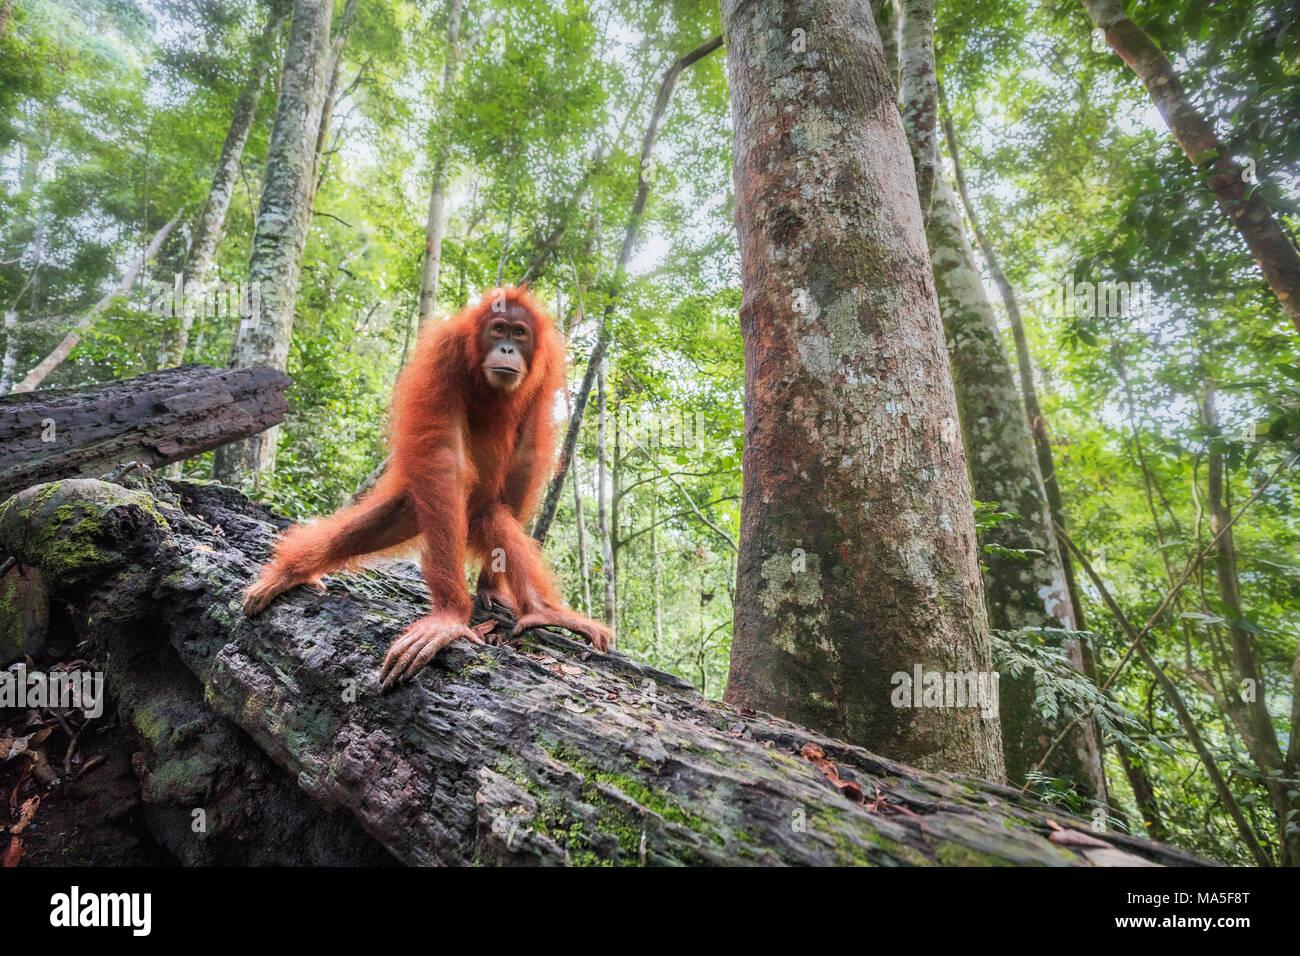 Sumatran orangutan, Pongo Abelii, Gunung Leuser National Park, Sumatra, Indonesia Stock Photo